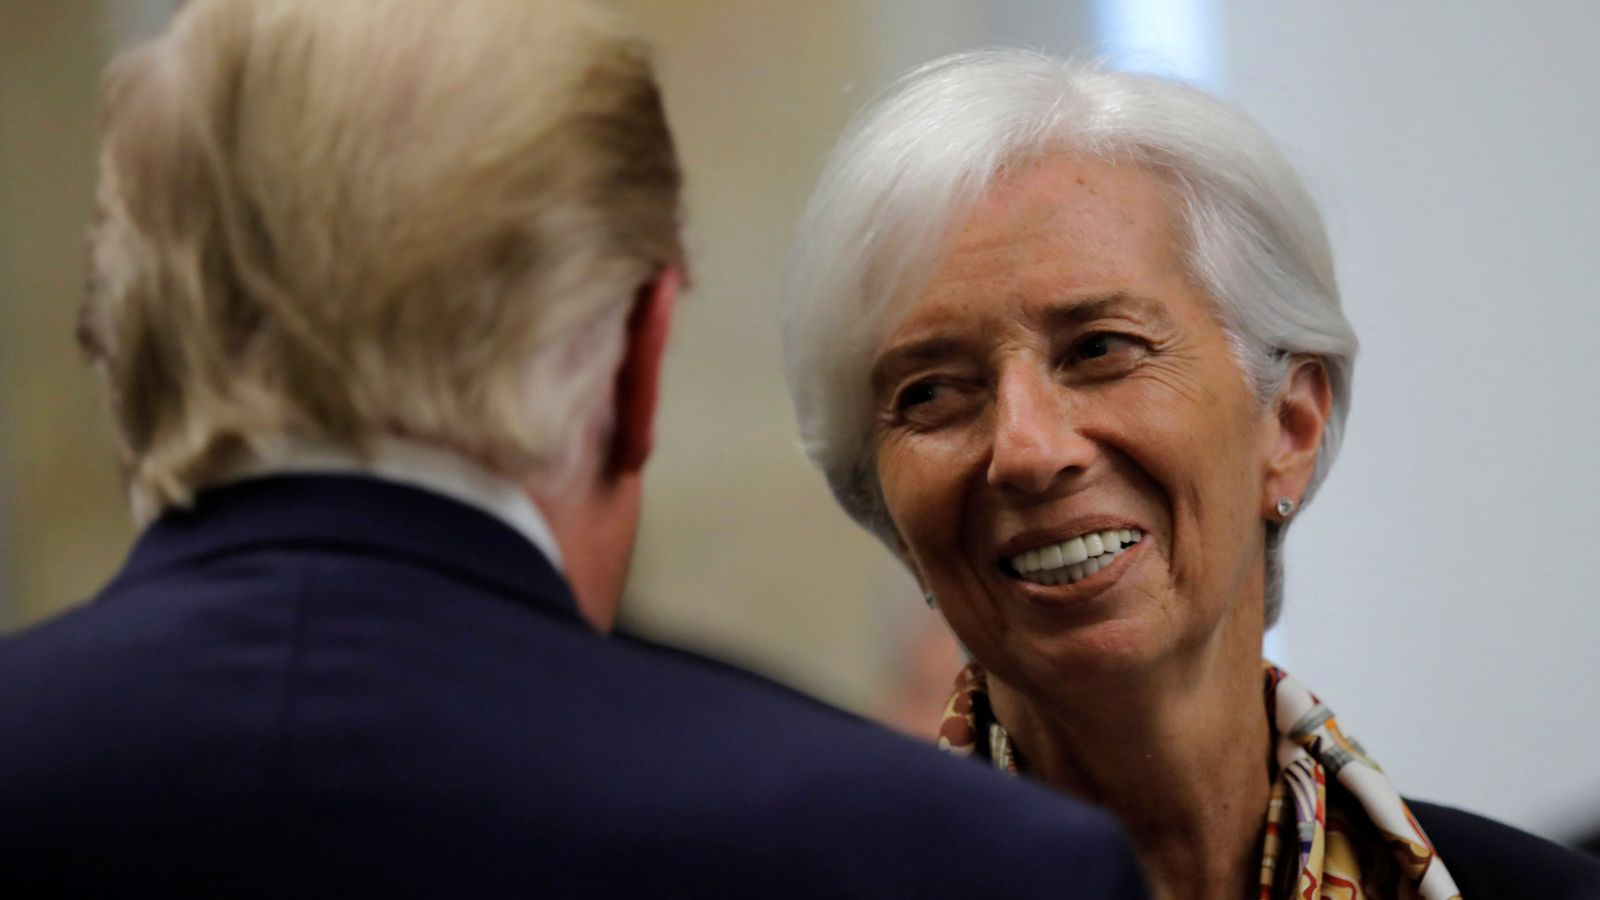 Foto: La próxima presidenta del BCE, Christine Lagarde, charla con Donald Trump en Washiington. (Reuters)